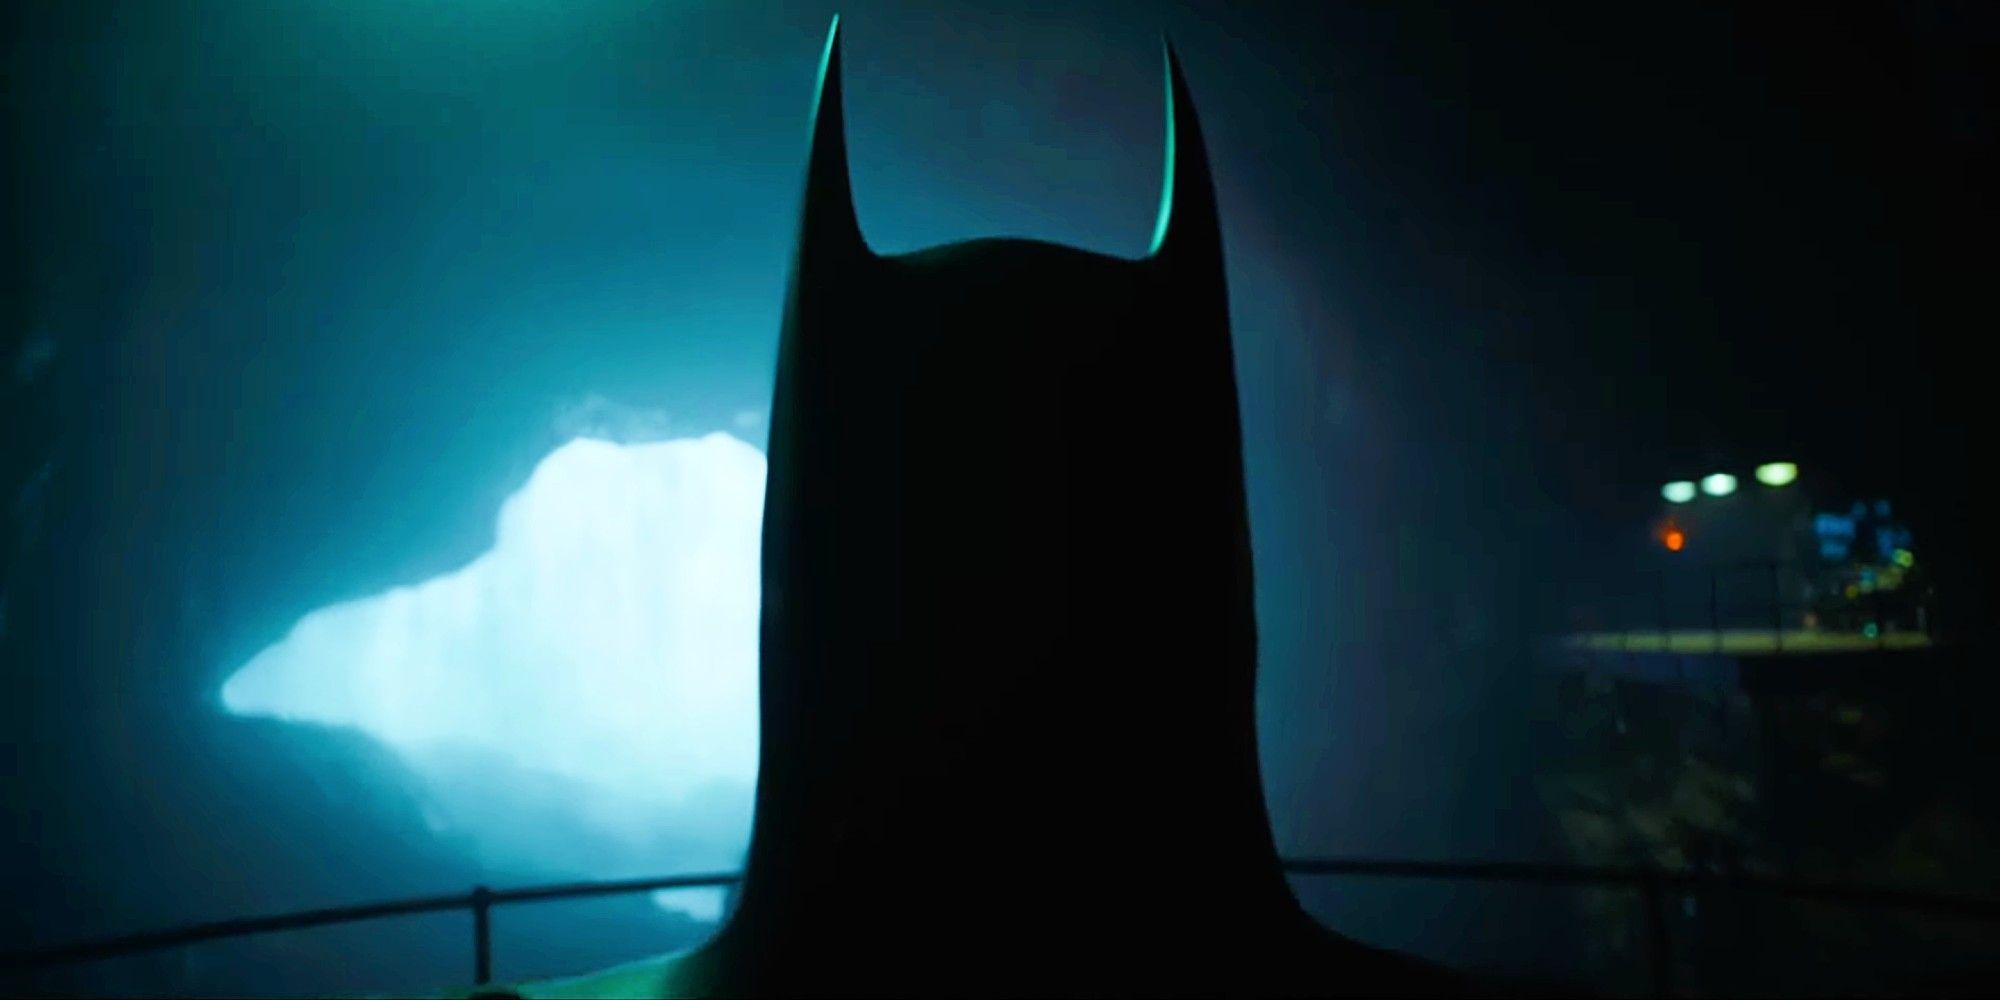 Michael Keaton s Batman Returns To The Batcave In The Flash Movie Image